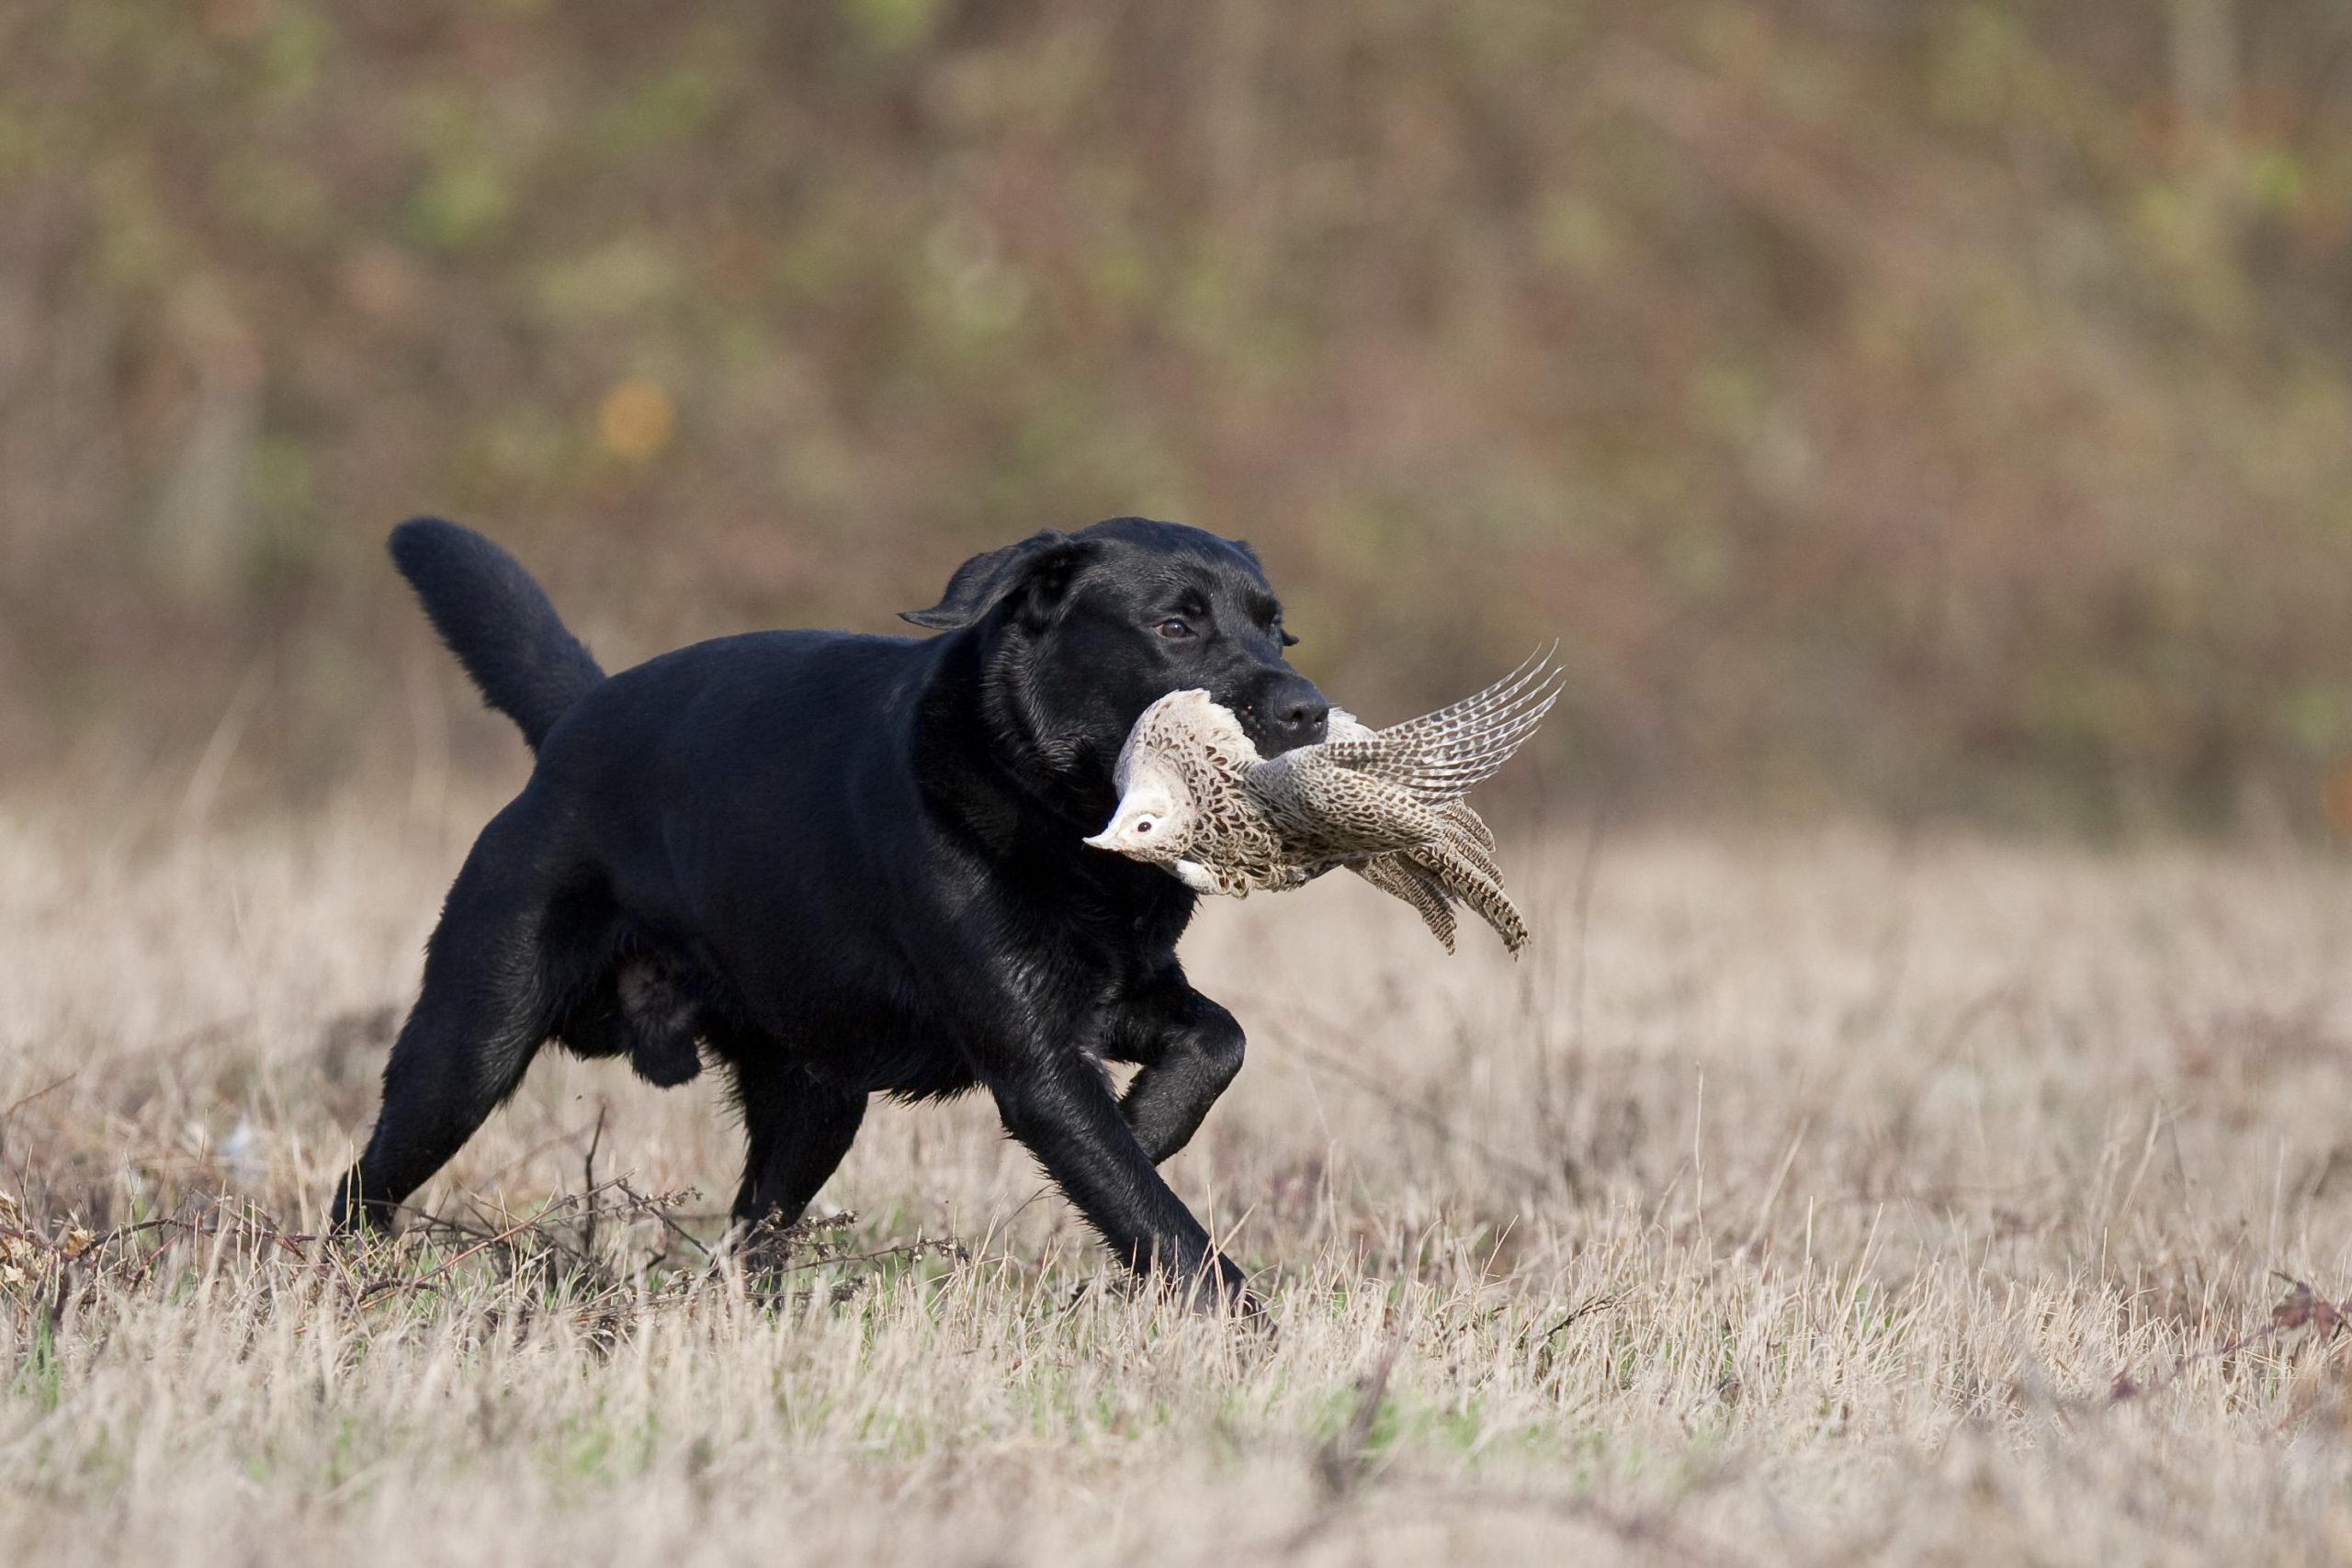 Chien de chasse de race labrador retriever du Labrador